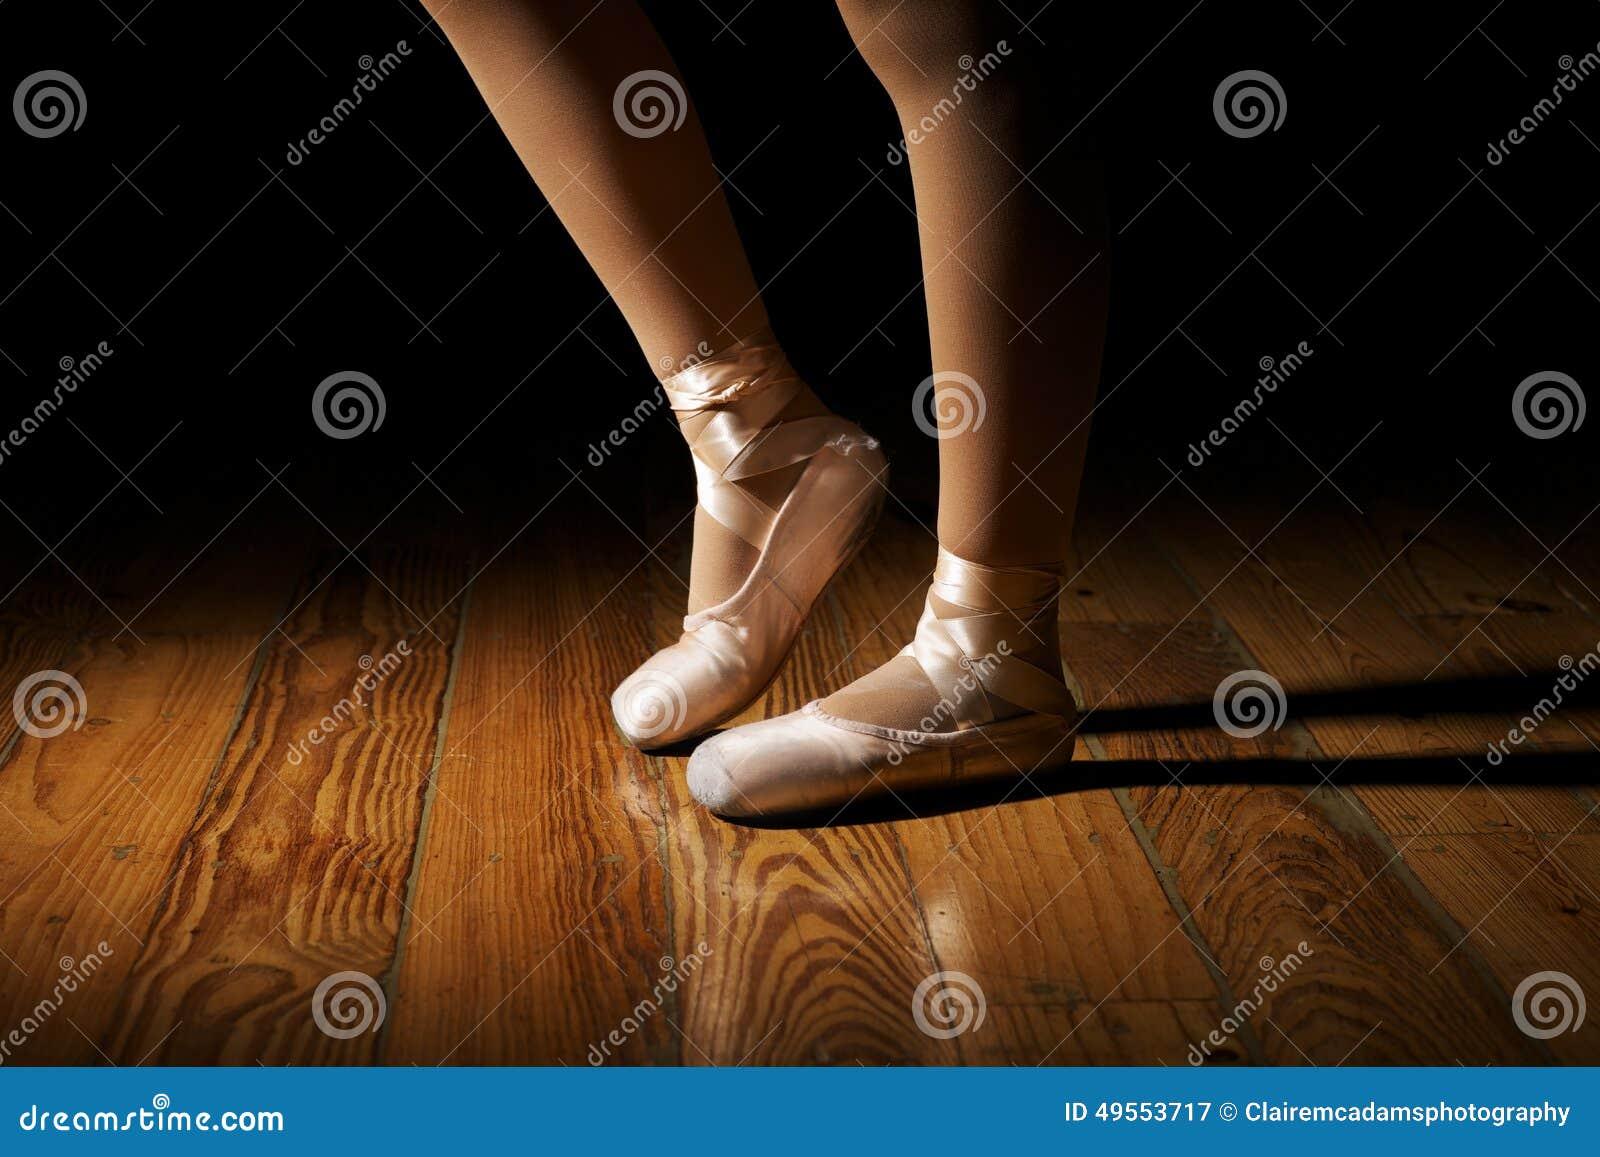 Ballerina Feet Stretching